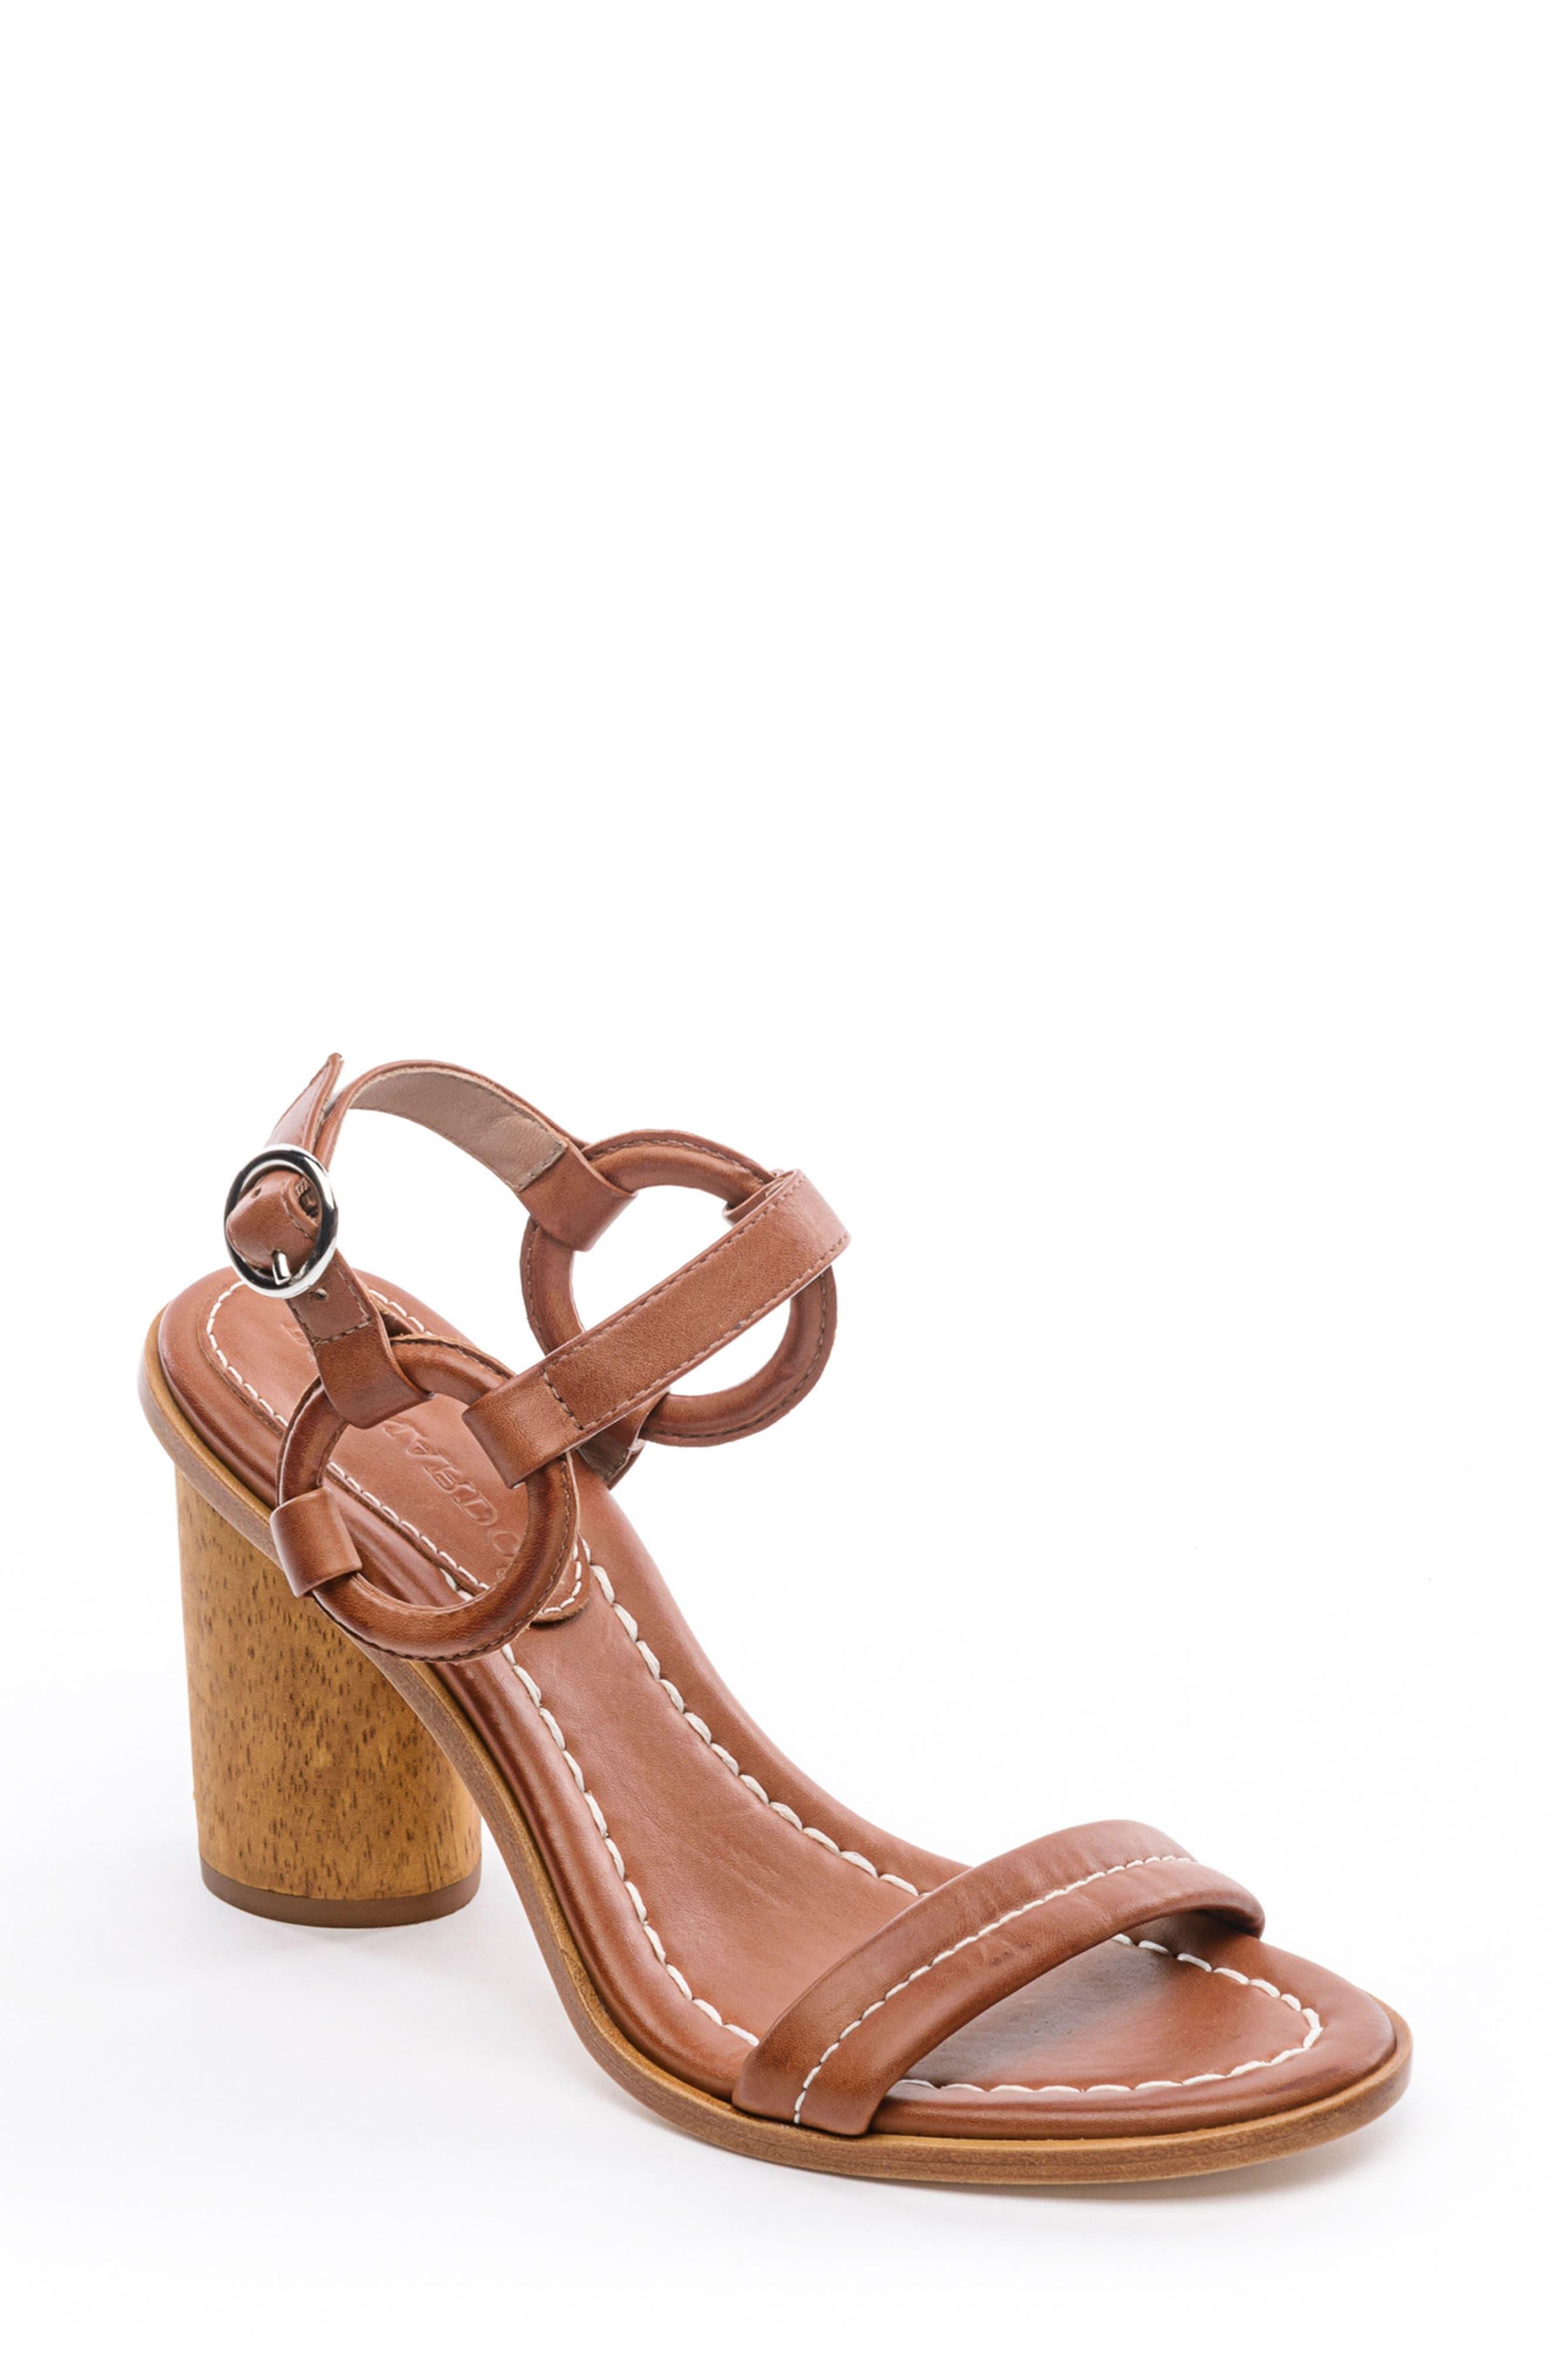 BERNARDO Harlow Ankle Strap Sandal, Main, color, LUGGAGE LEATHER